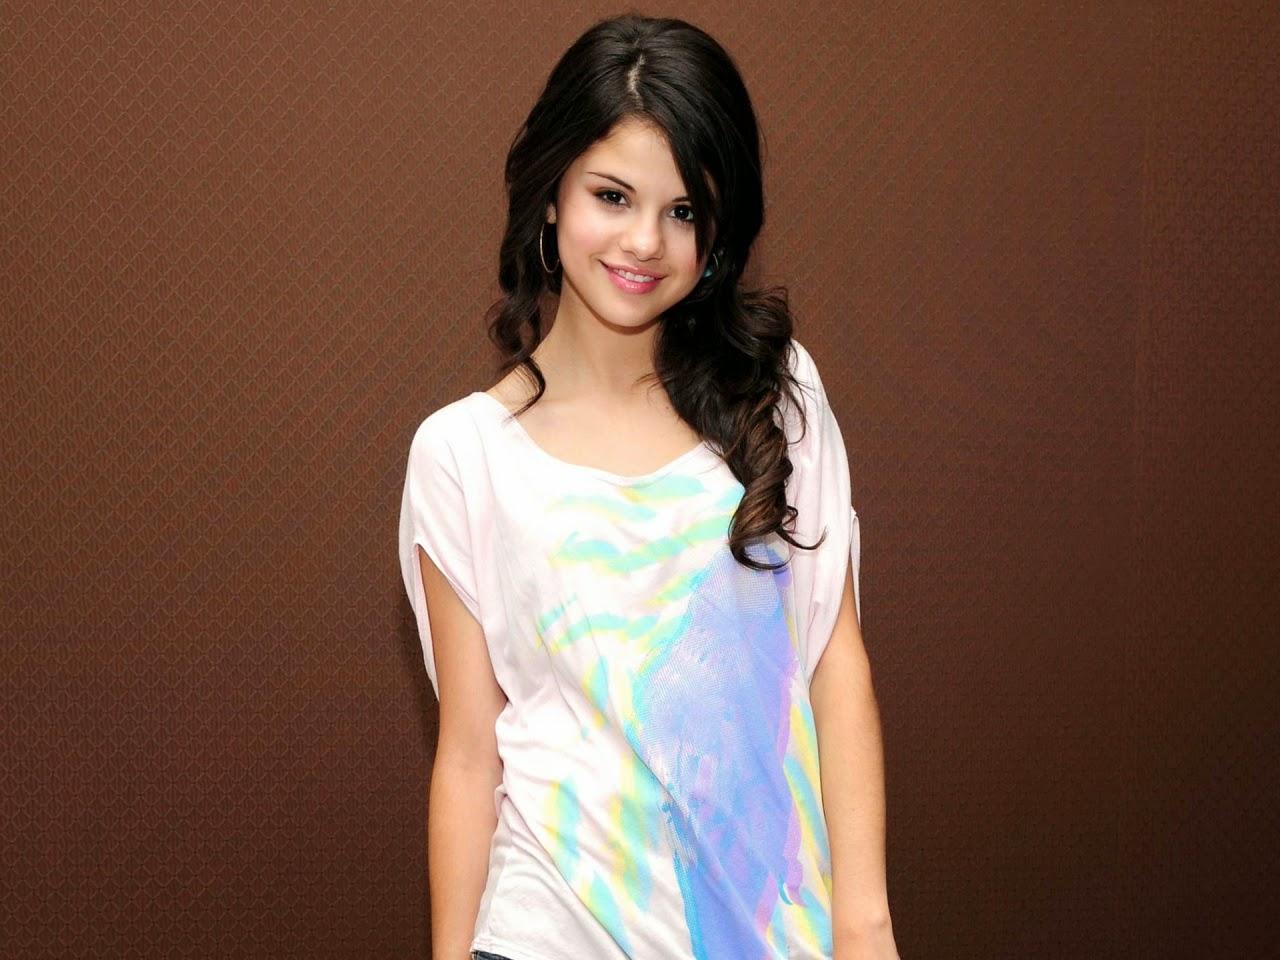 Selena Gomez New Hd Wallpaper 2014 Beautiful World